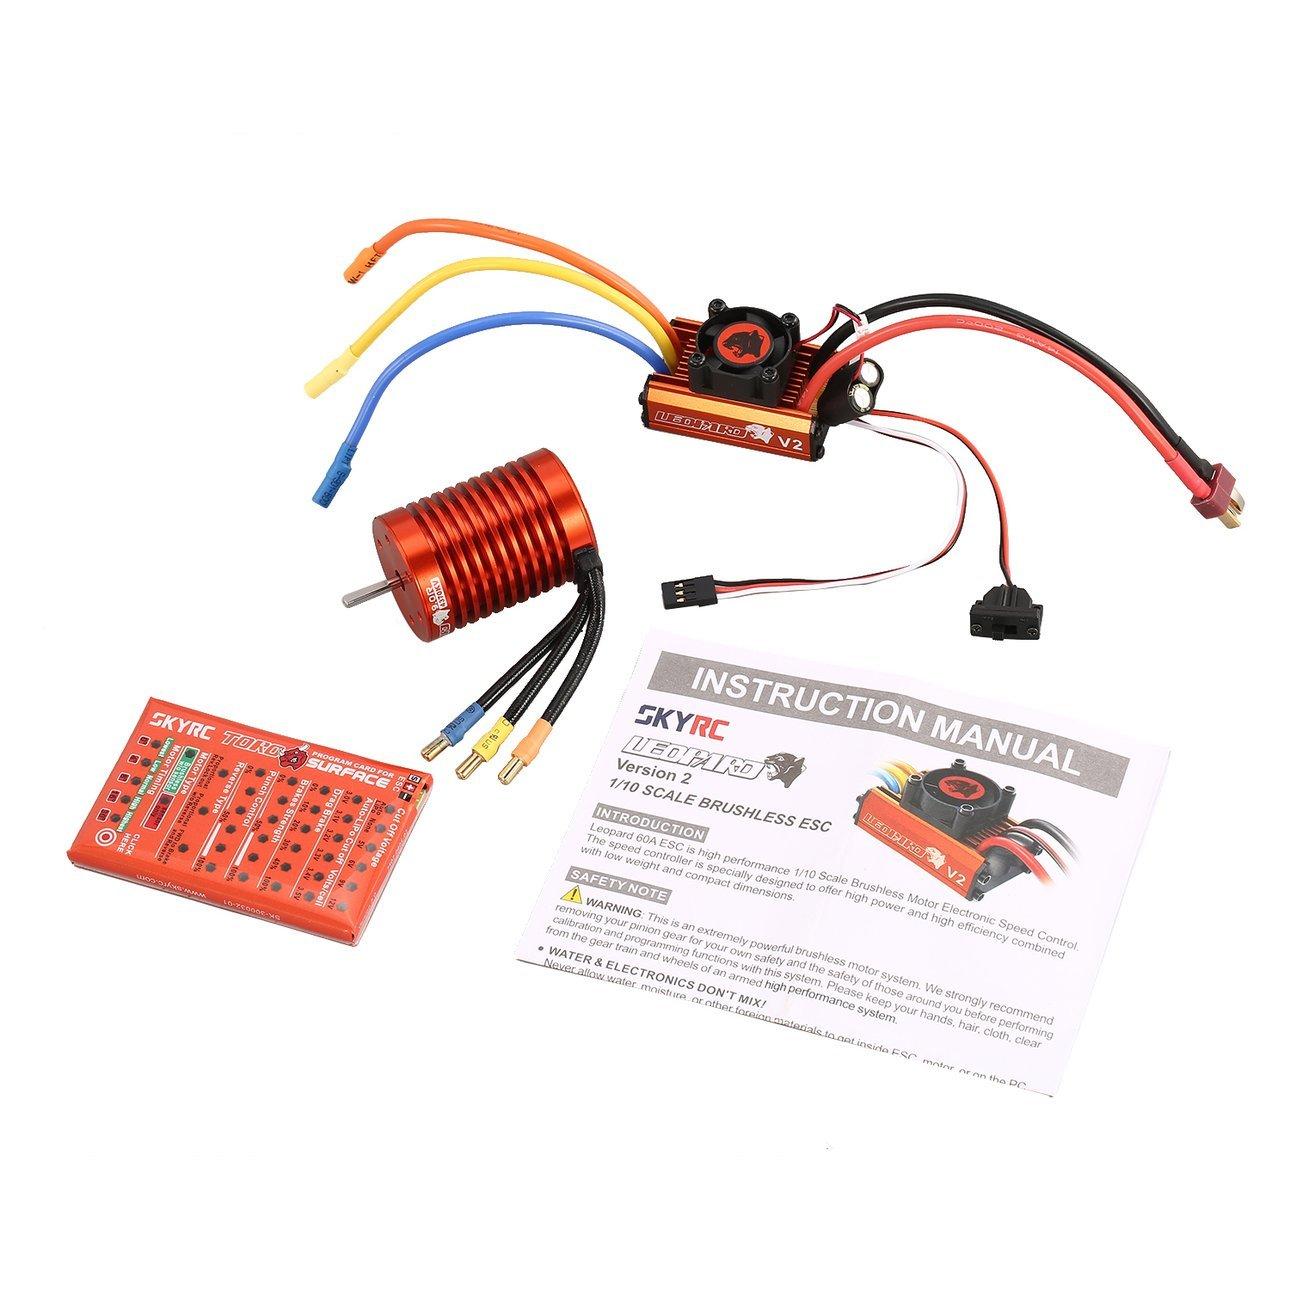 Ballylelly SKYRC 9T 4370KV Brushless Motor 60A ESC Programmierkarte Kit für 1/10 RC Auto